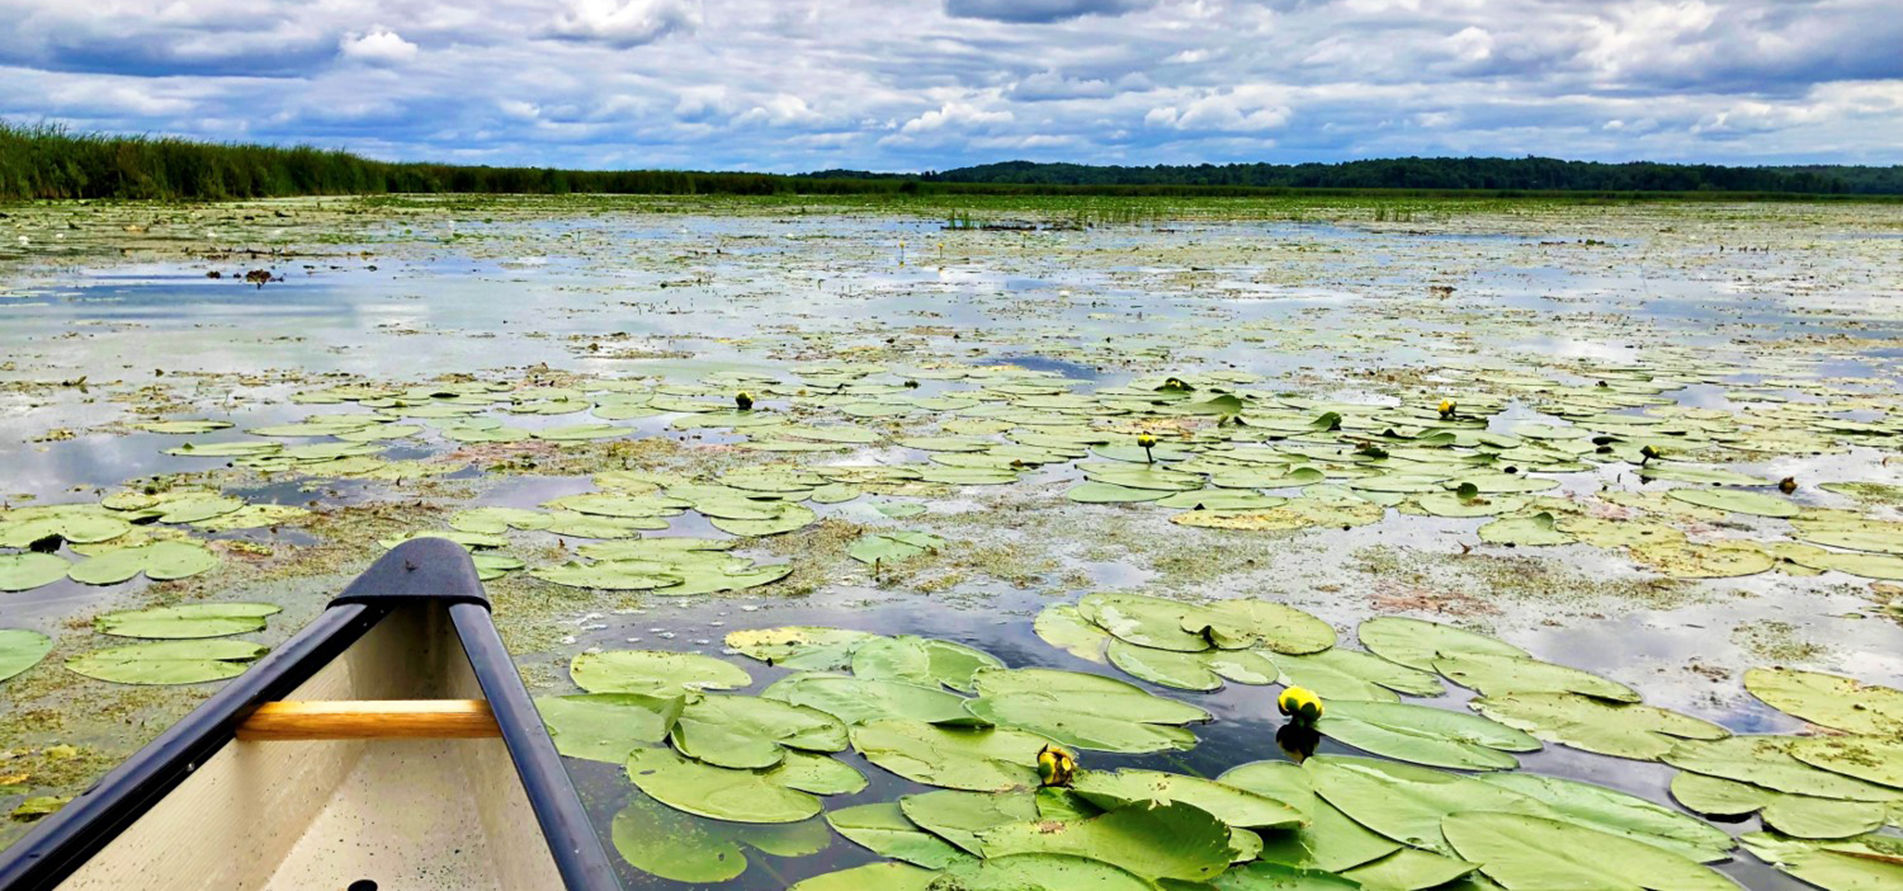 Paddling a canoe through Gananoque Lake's beautiful wetlands